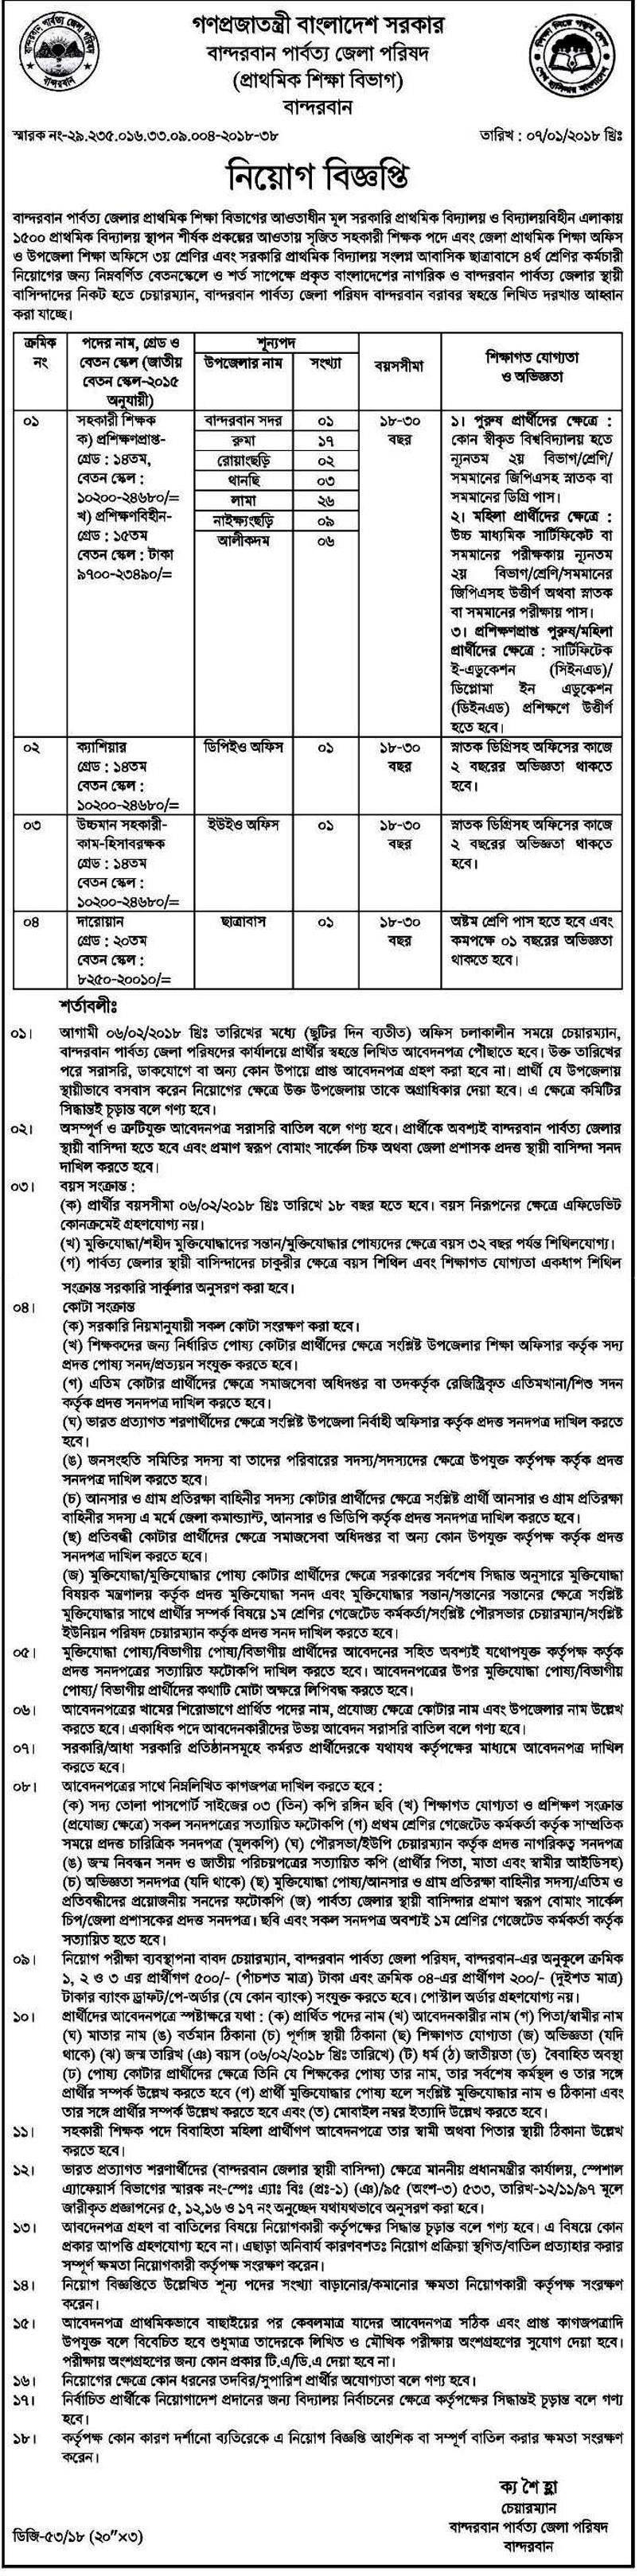 Primary School Job Circular 2018